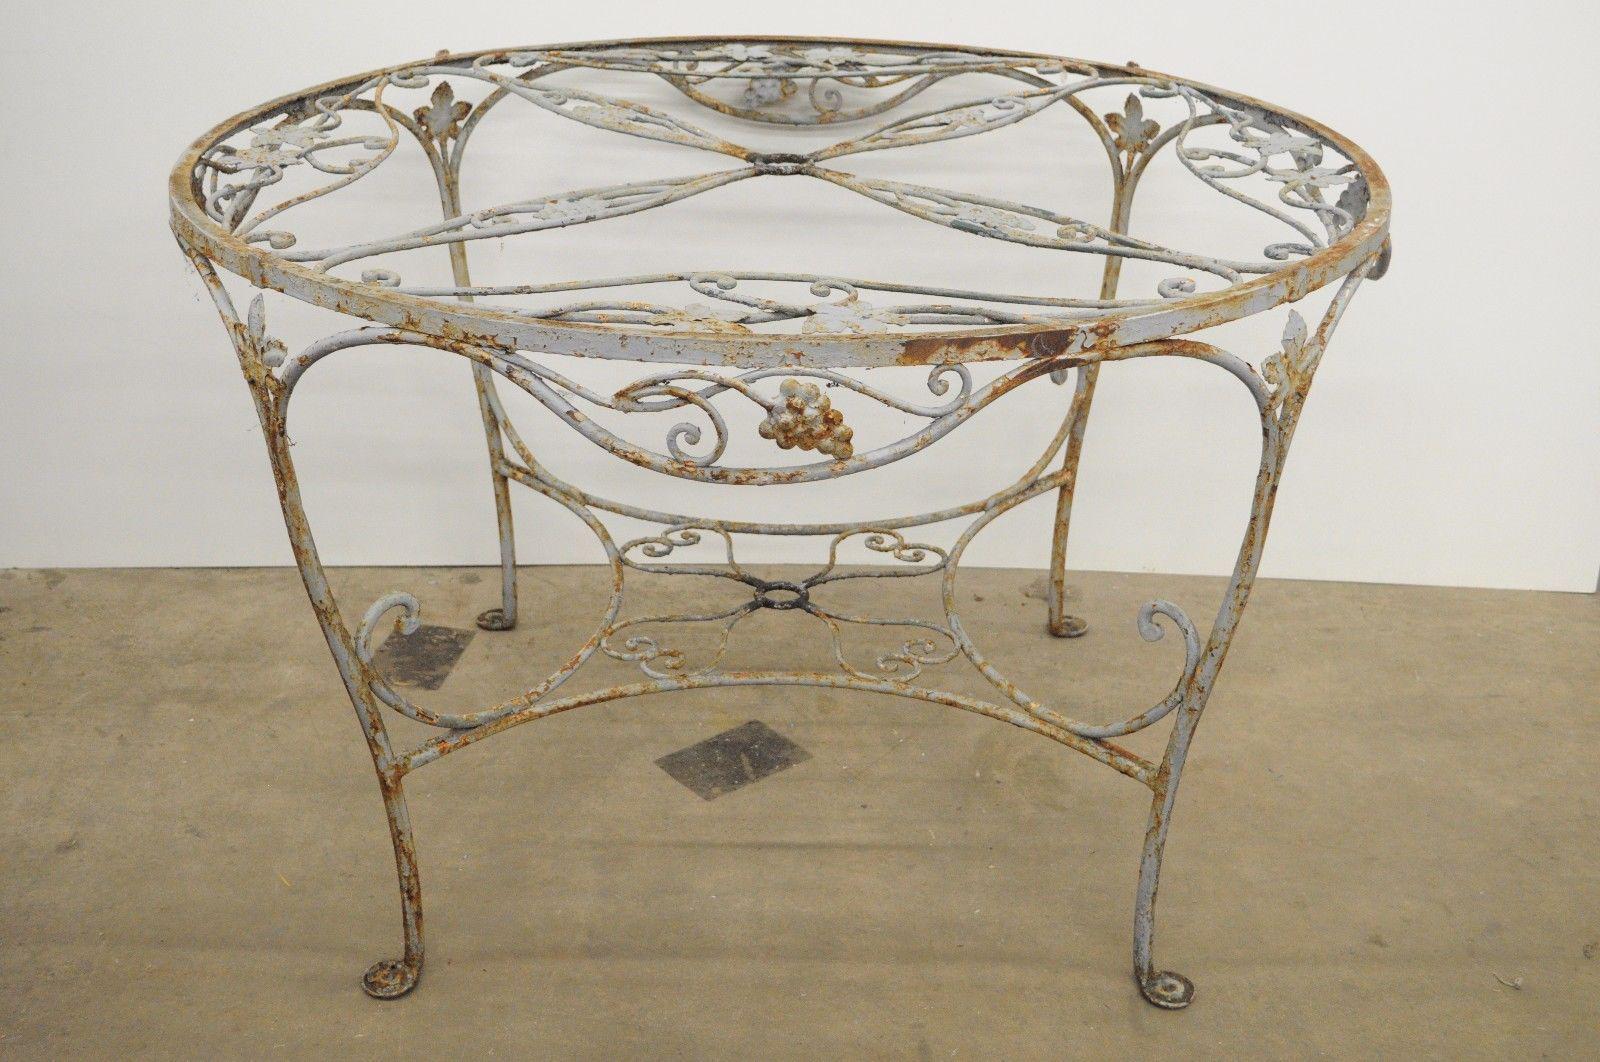 Merveilleux Vintage Art Nouveau 5 Pc Wrought Iron Patio Dining Set Round Table 4 Chair  Salterini For